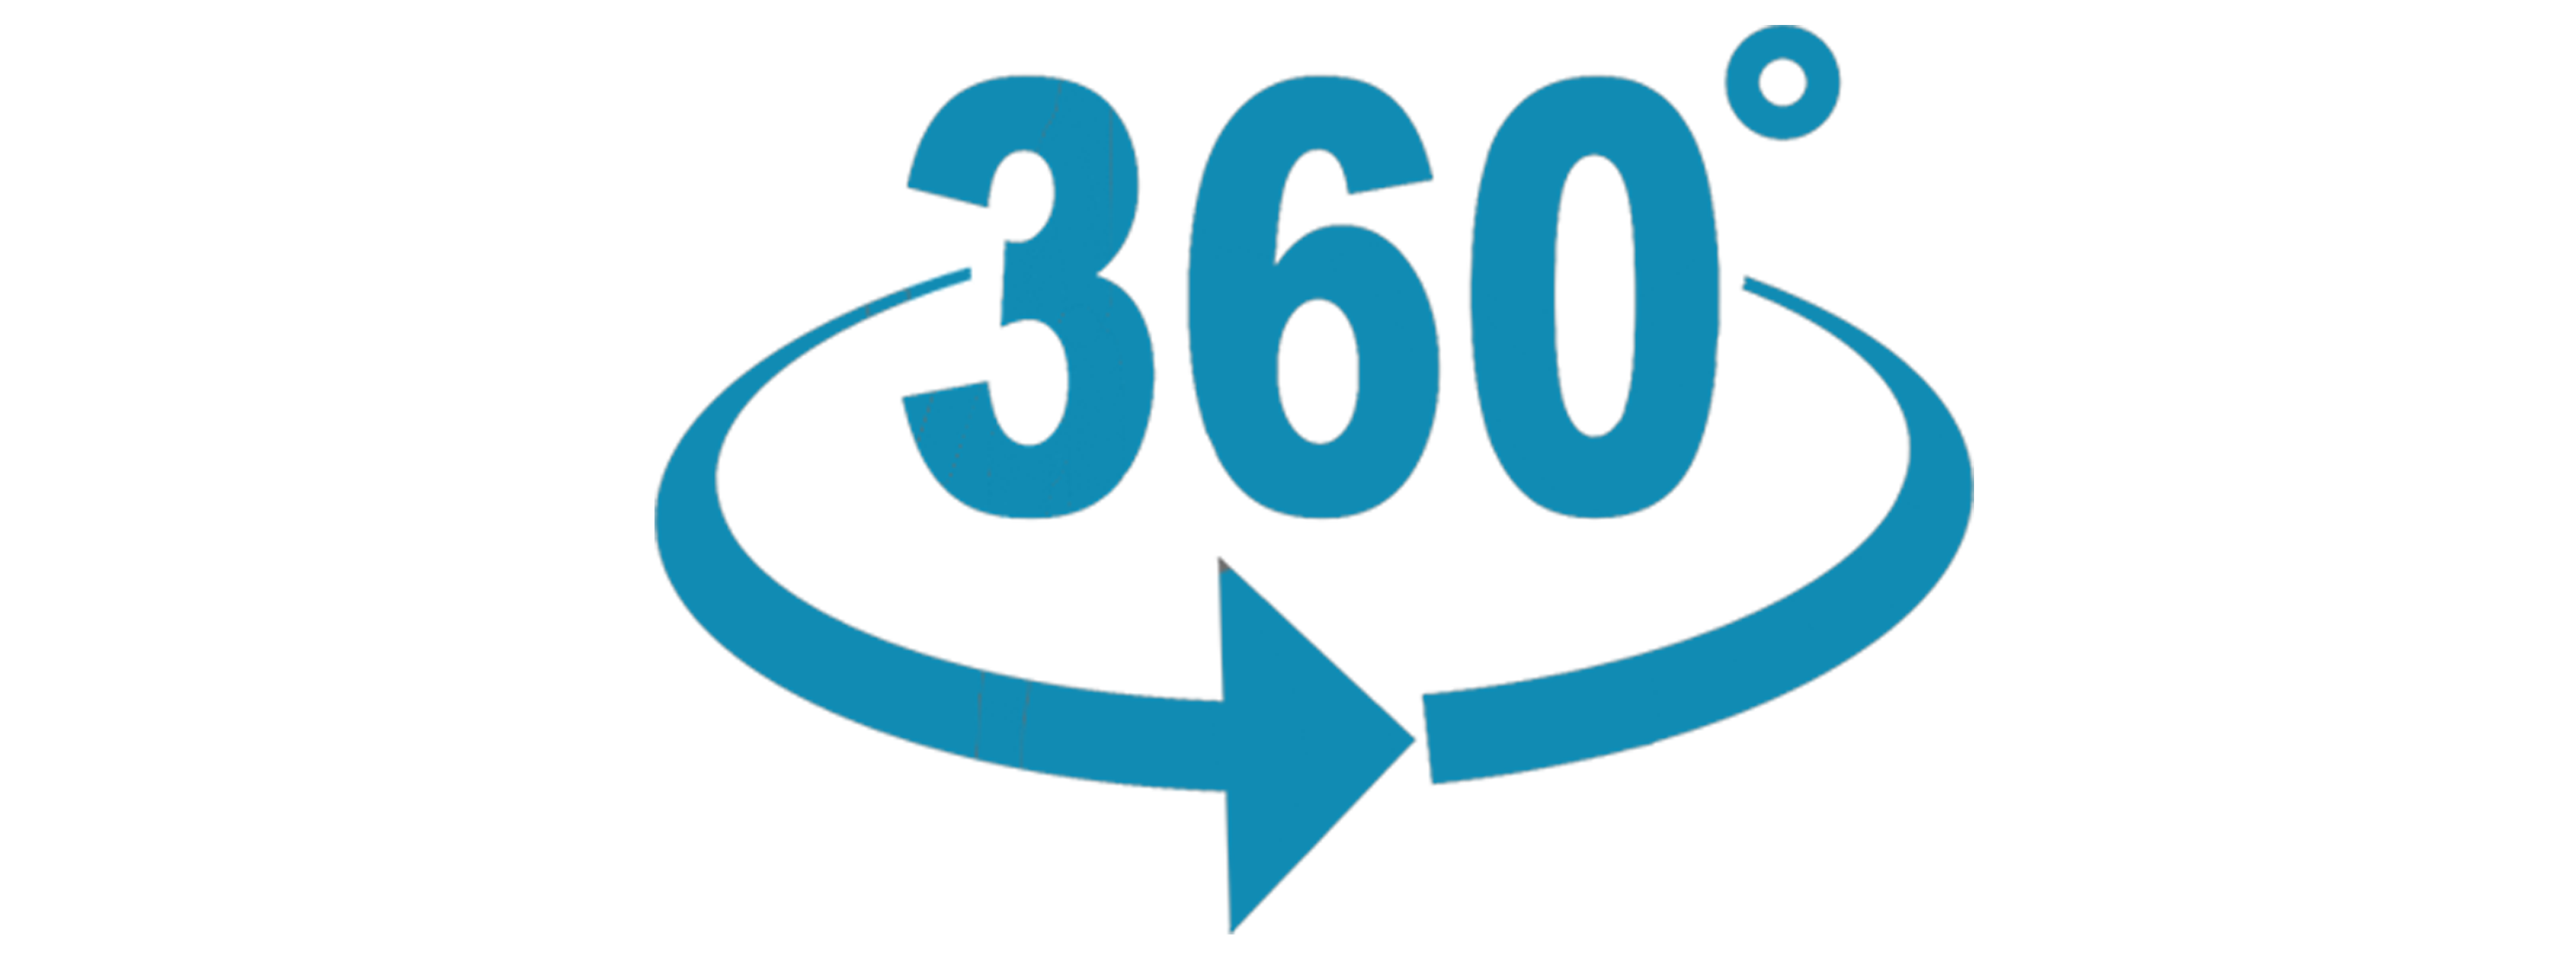 360-graden-viewer